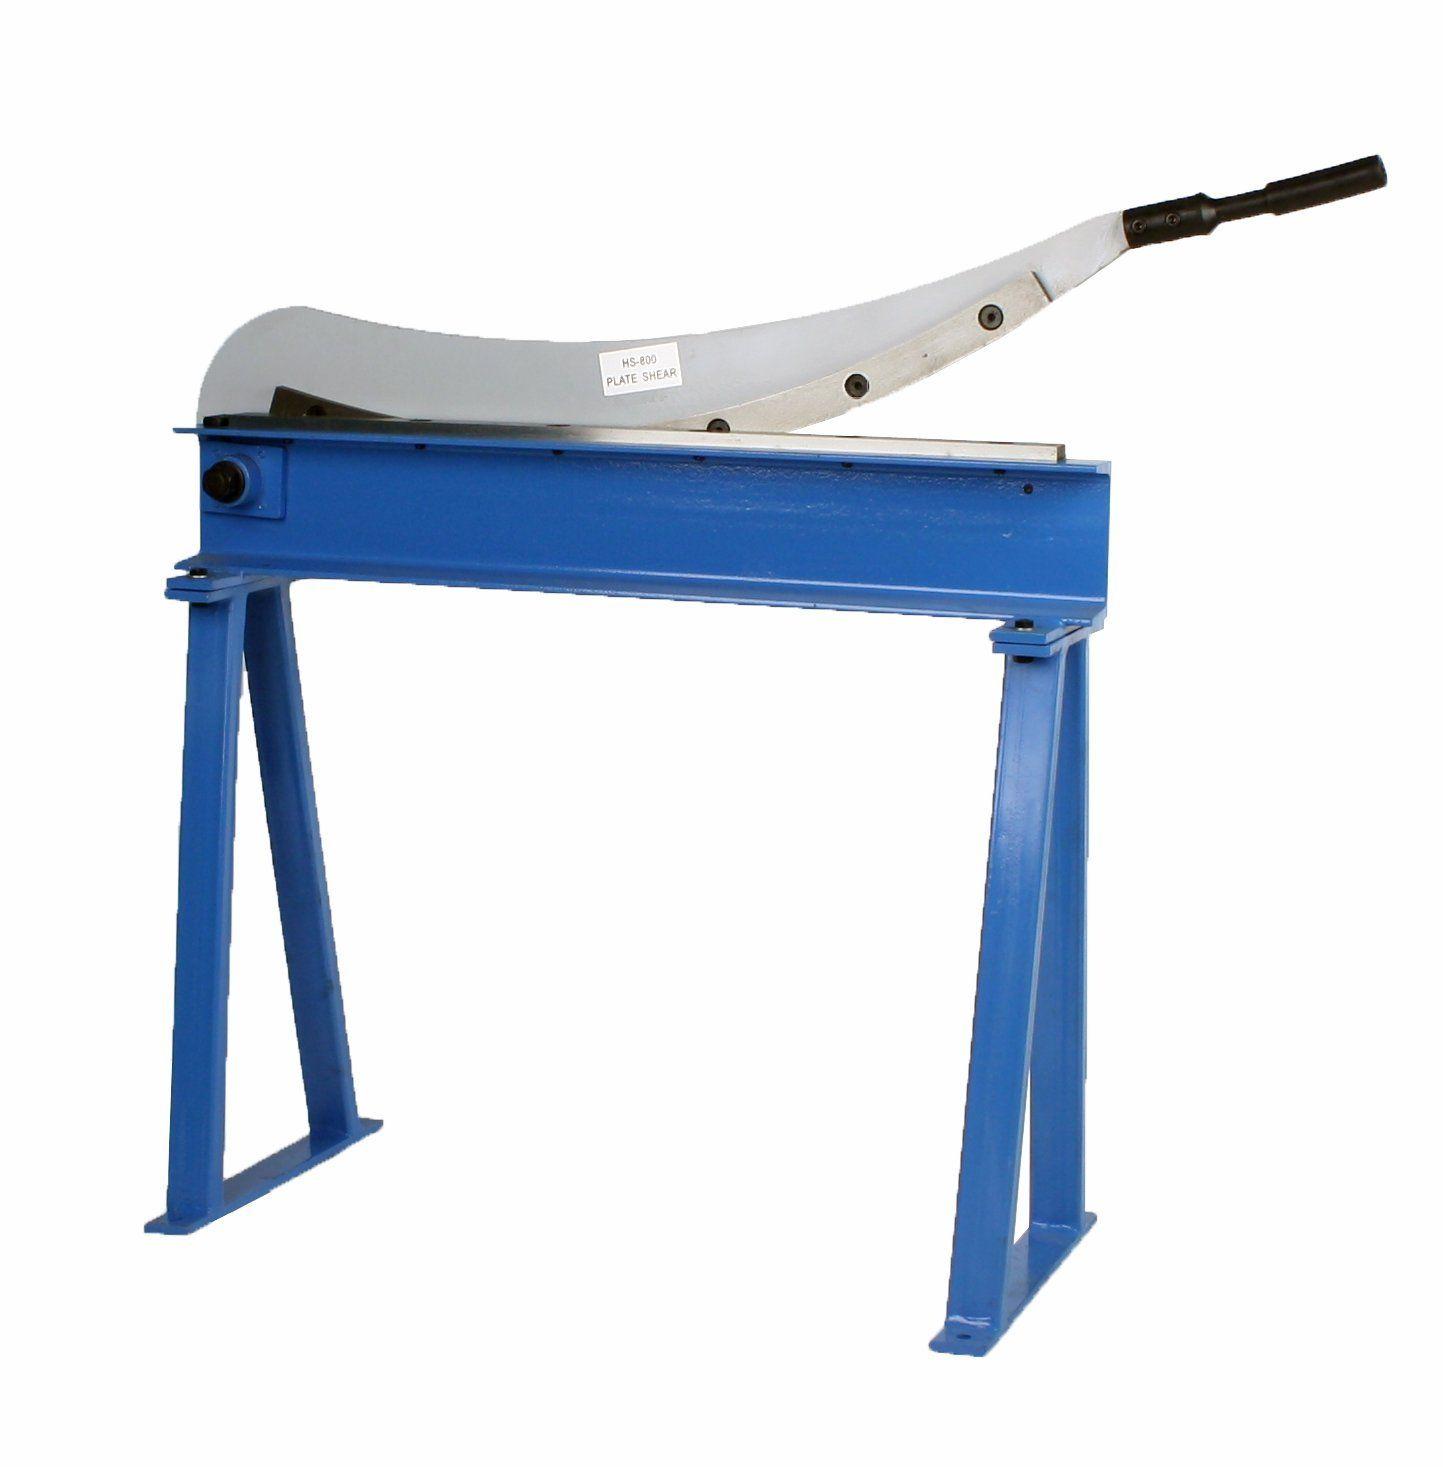 Guillotine Shear 32 X 16 Gauge Sheet Metal Plate Cutter